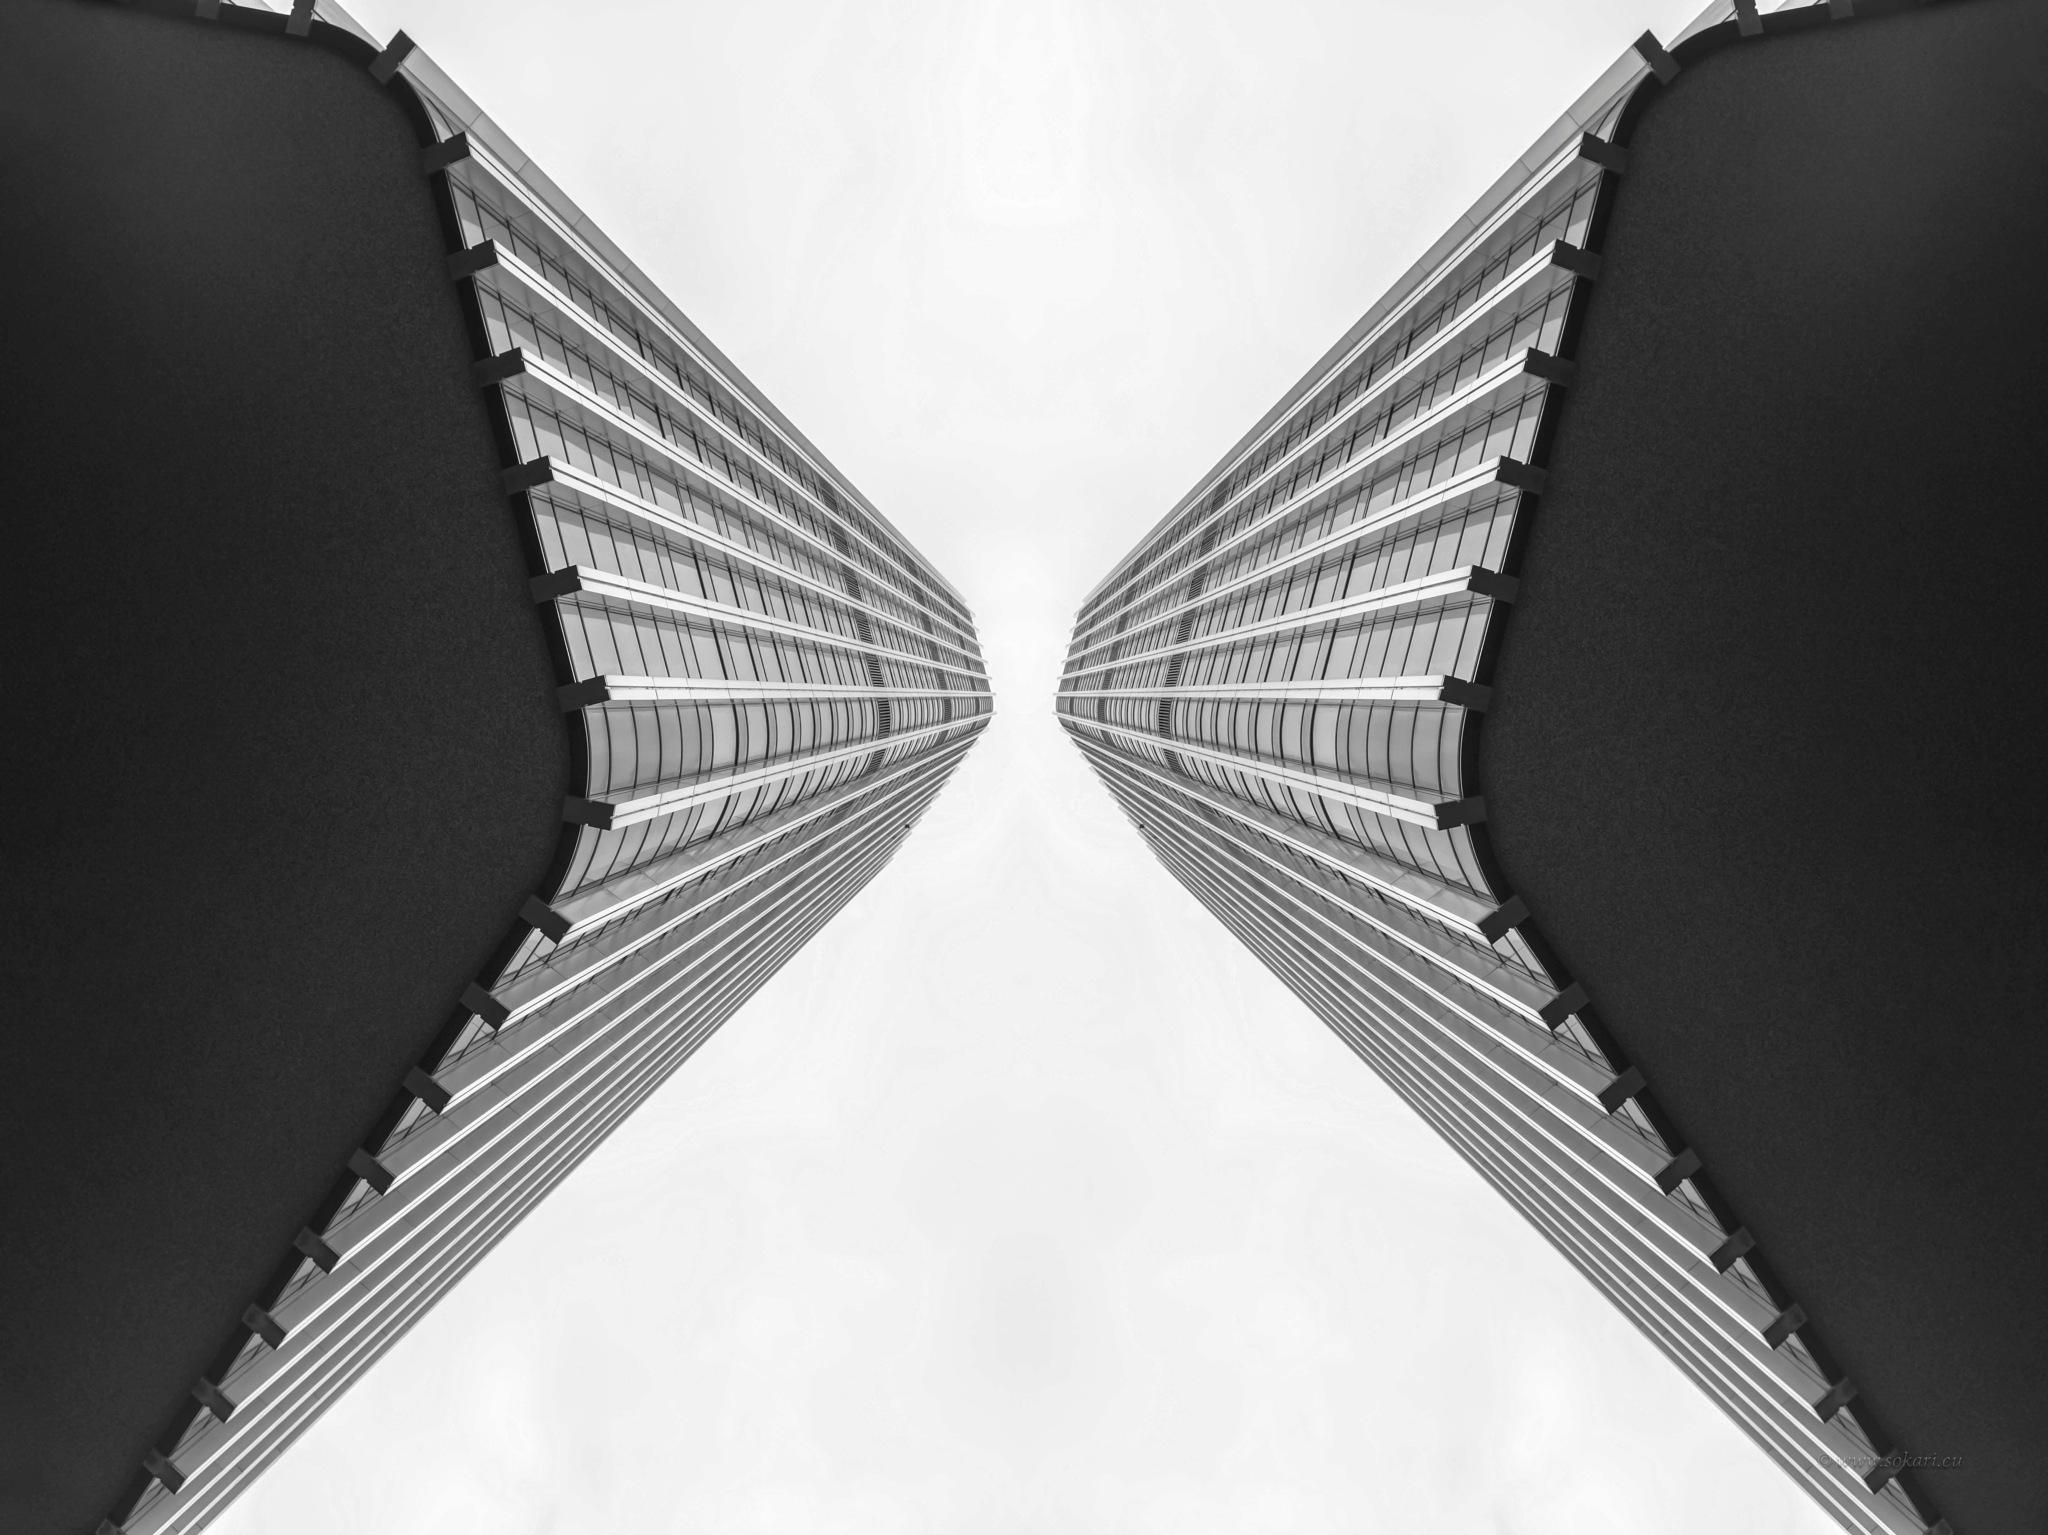 Tower 42 by sokarieu